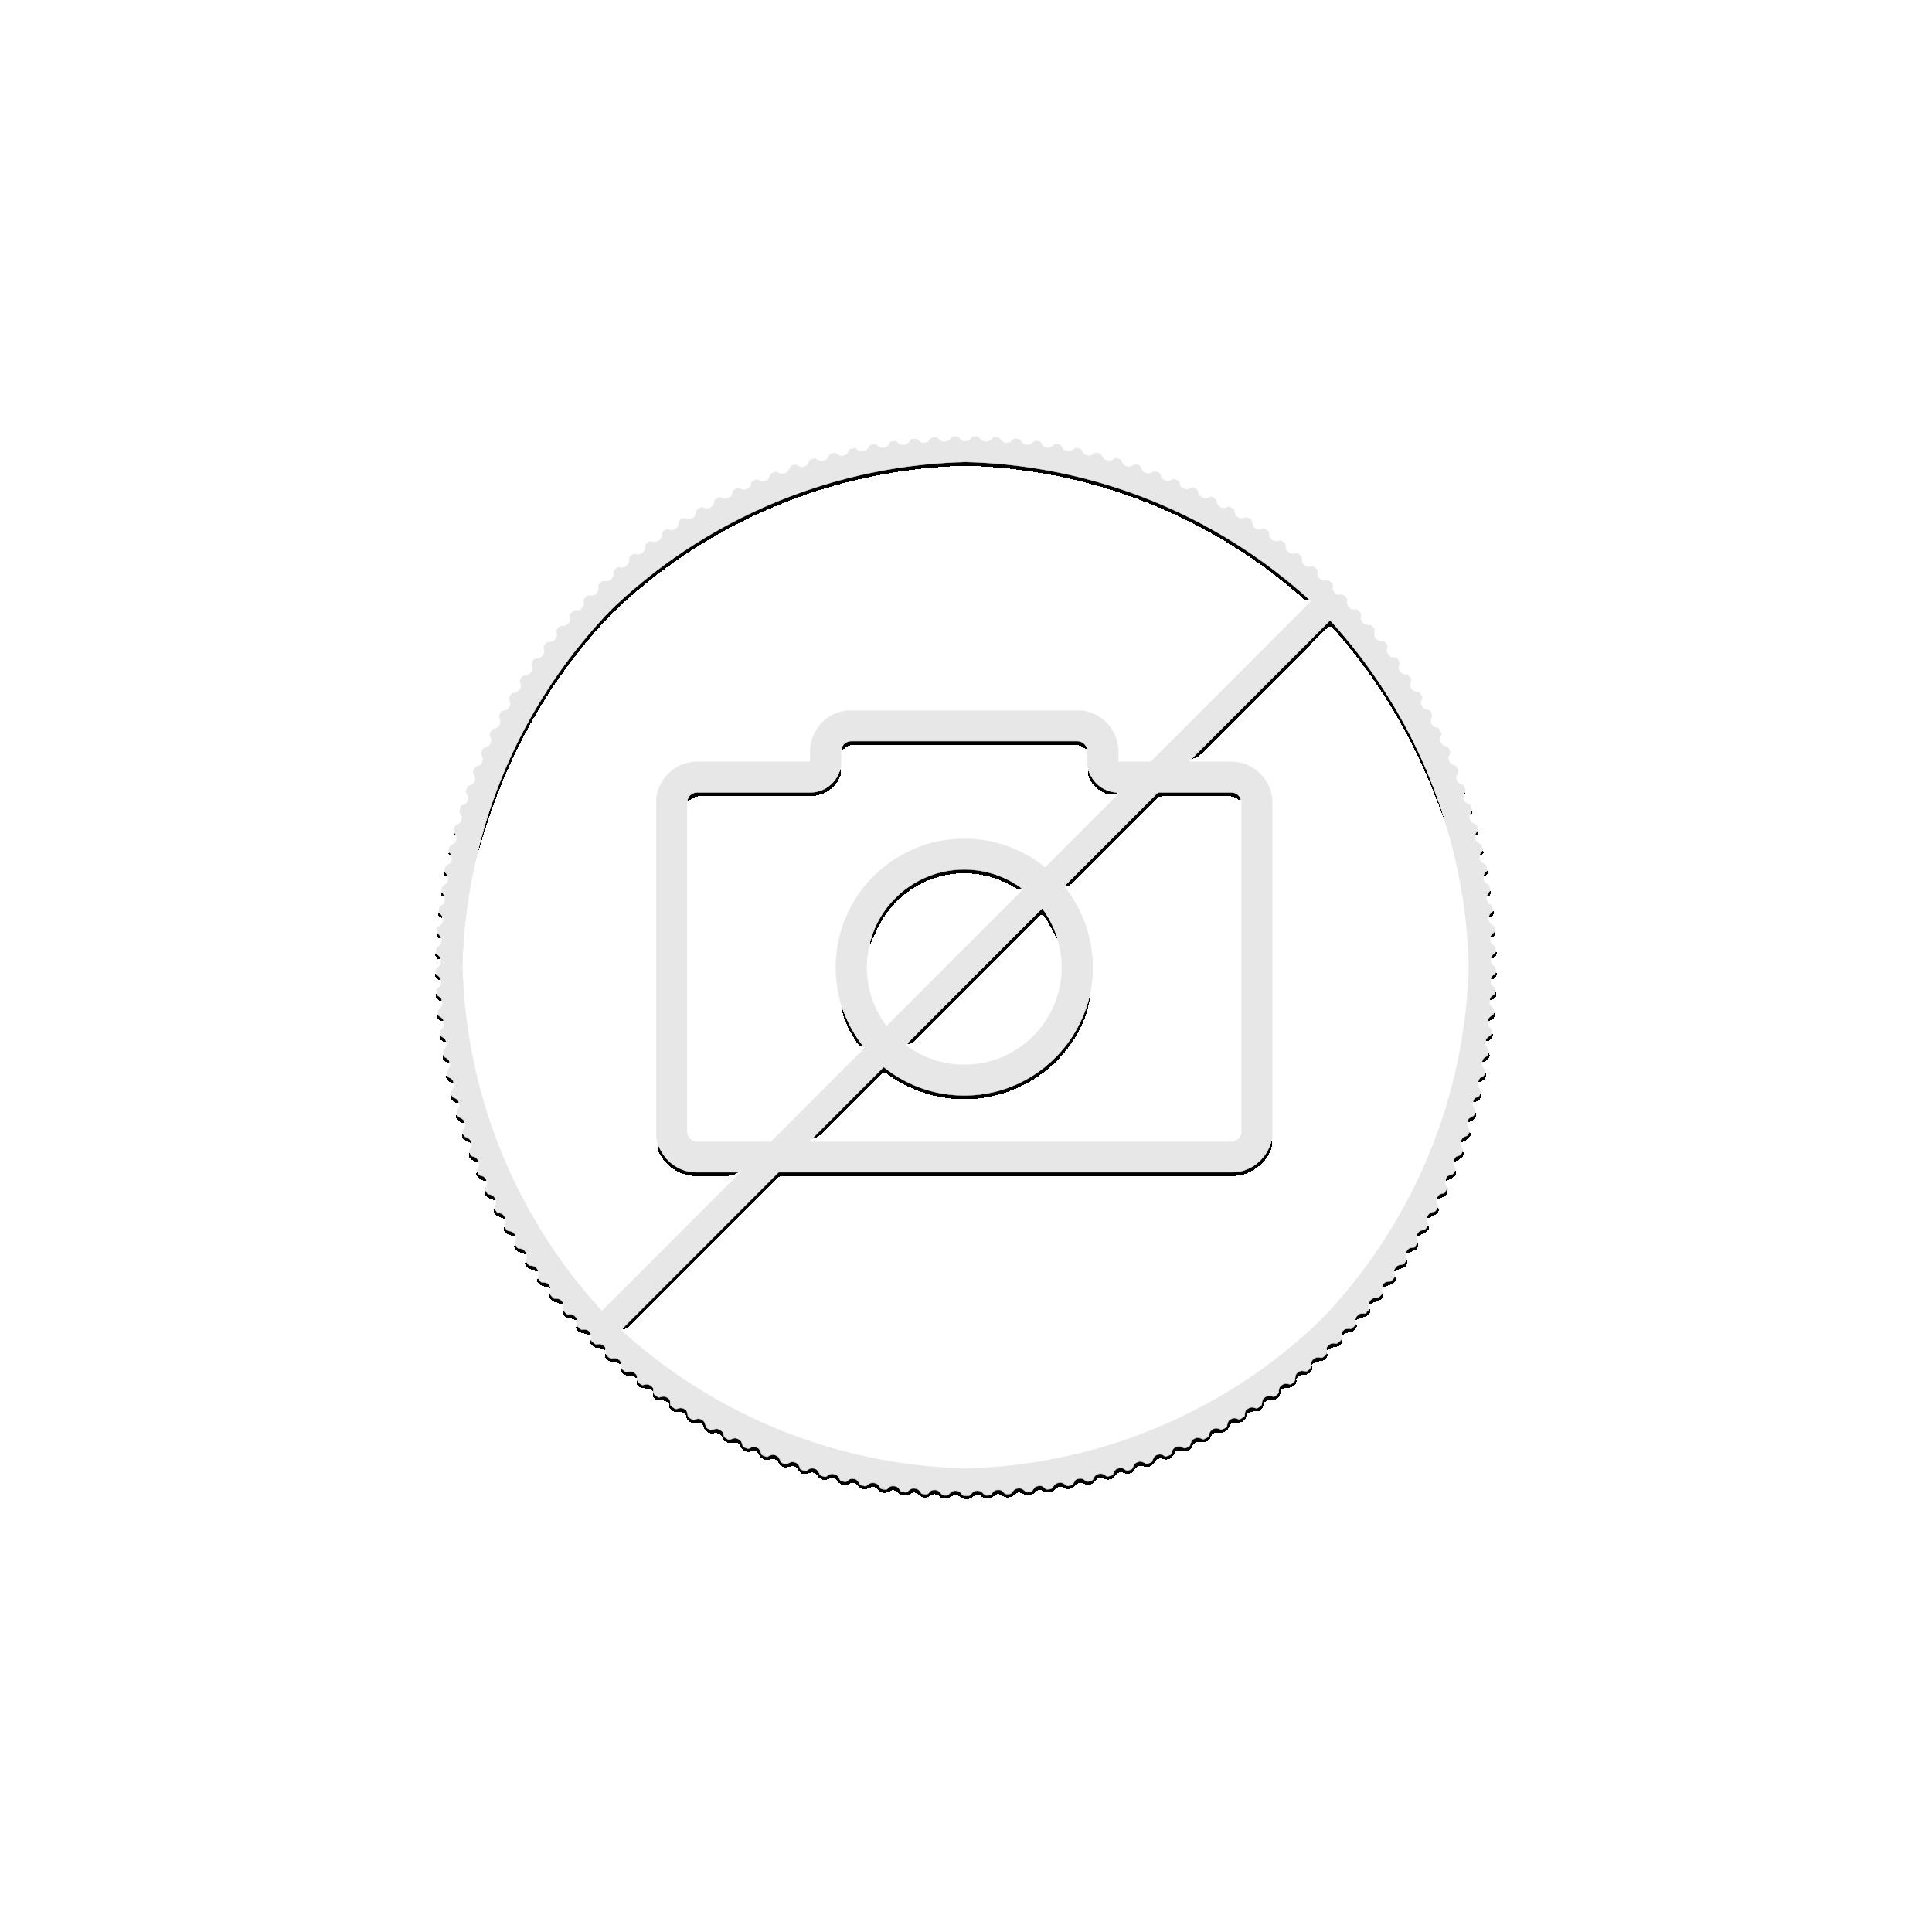 1 Troy ounce zilveren muntbaar Rectangular Dragon 2019